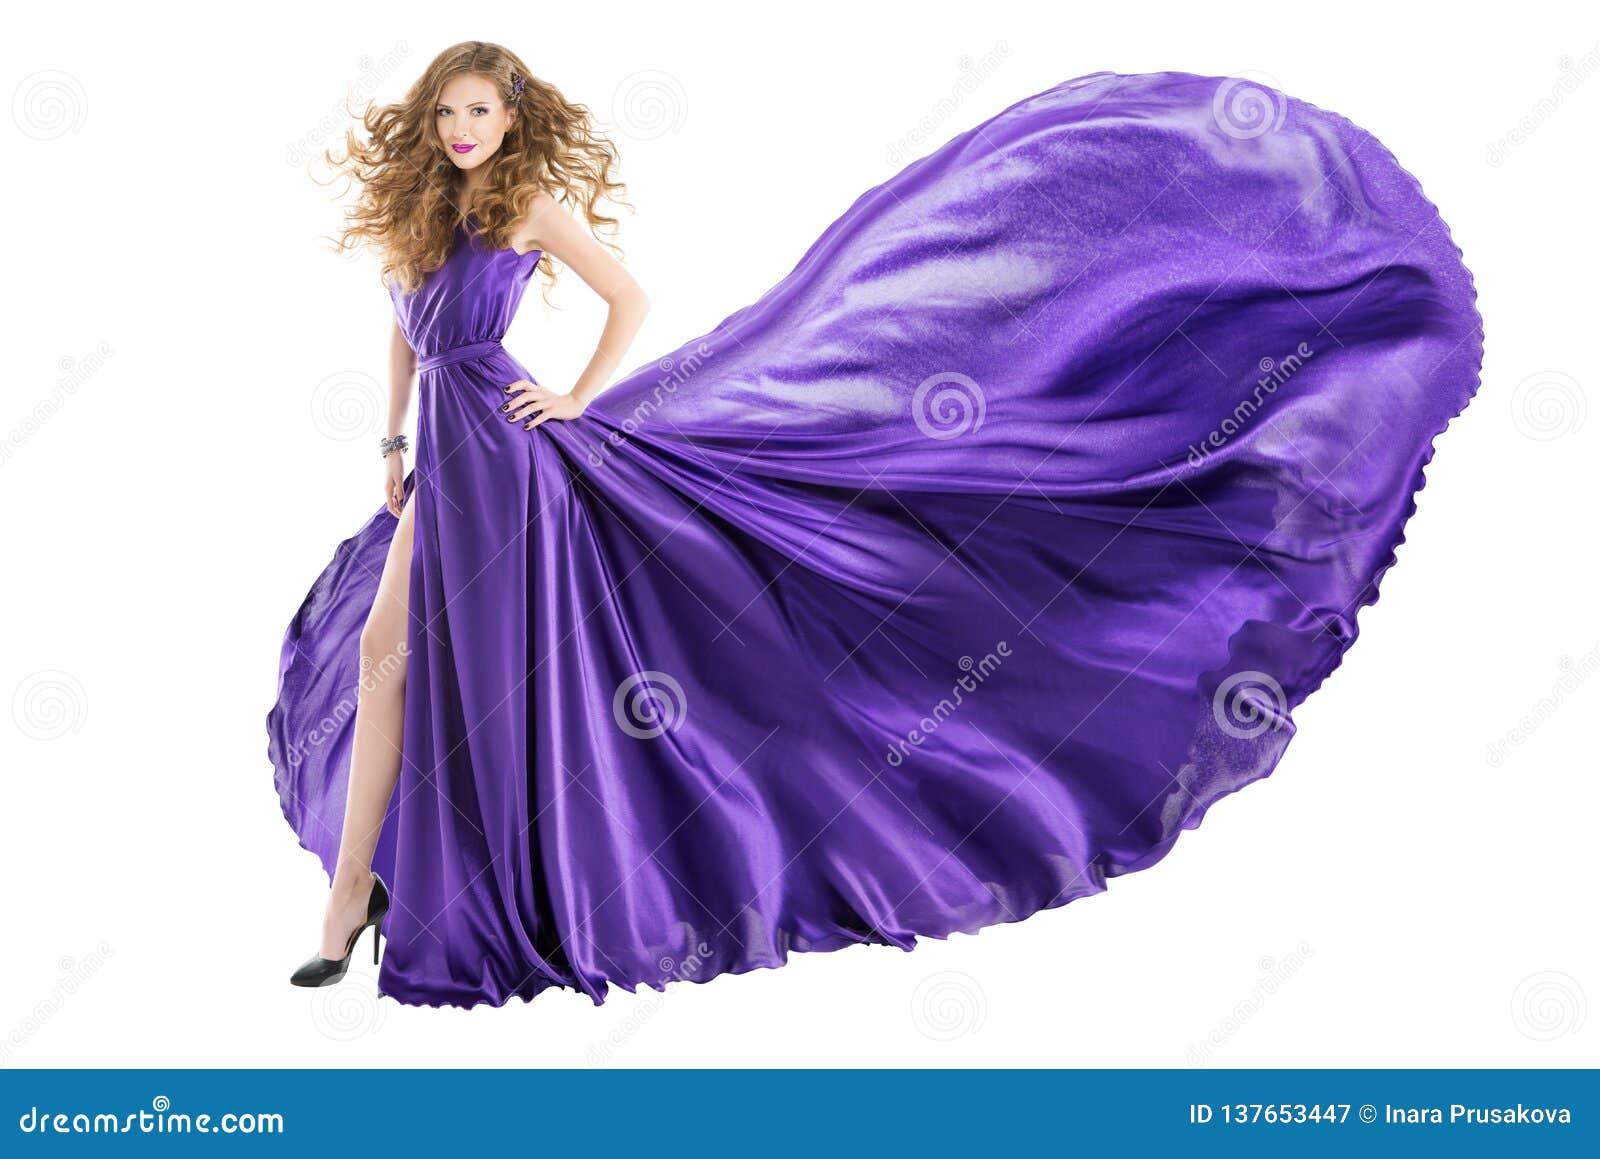 Frauen-purpurrotes Kleid, Mode-Modell im langen wellenartig bewegenden flatternden Kleid